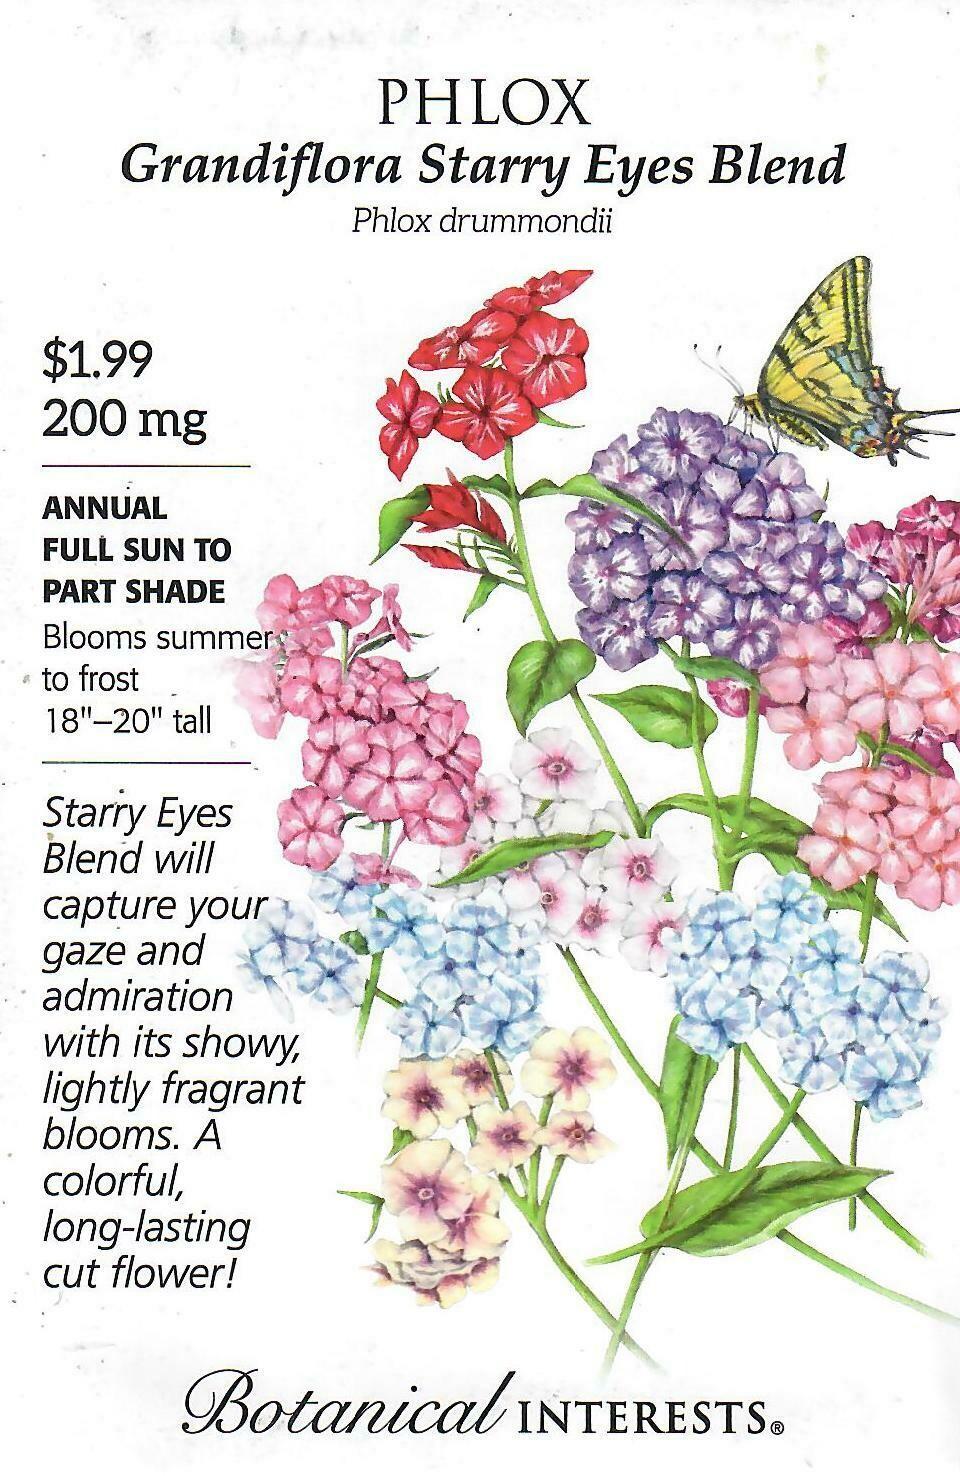 Phlox Grandiflora Starry Eyes Blend Botanical Interests